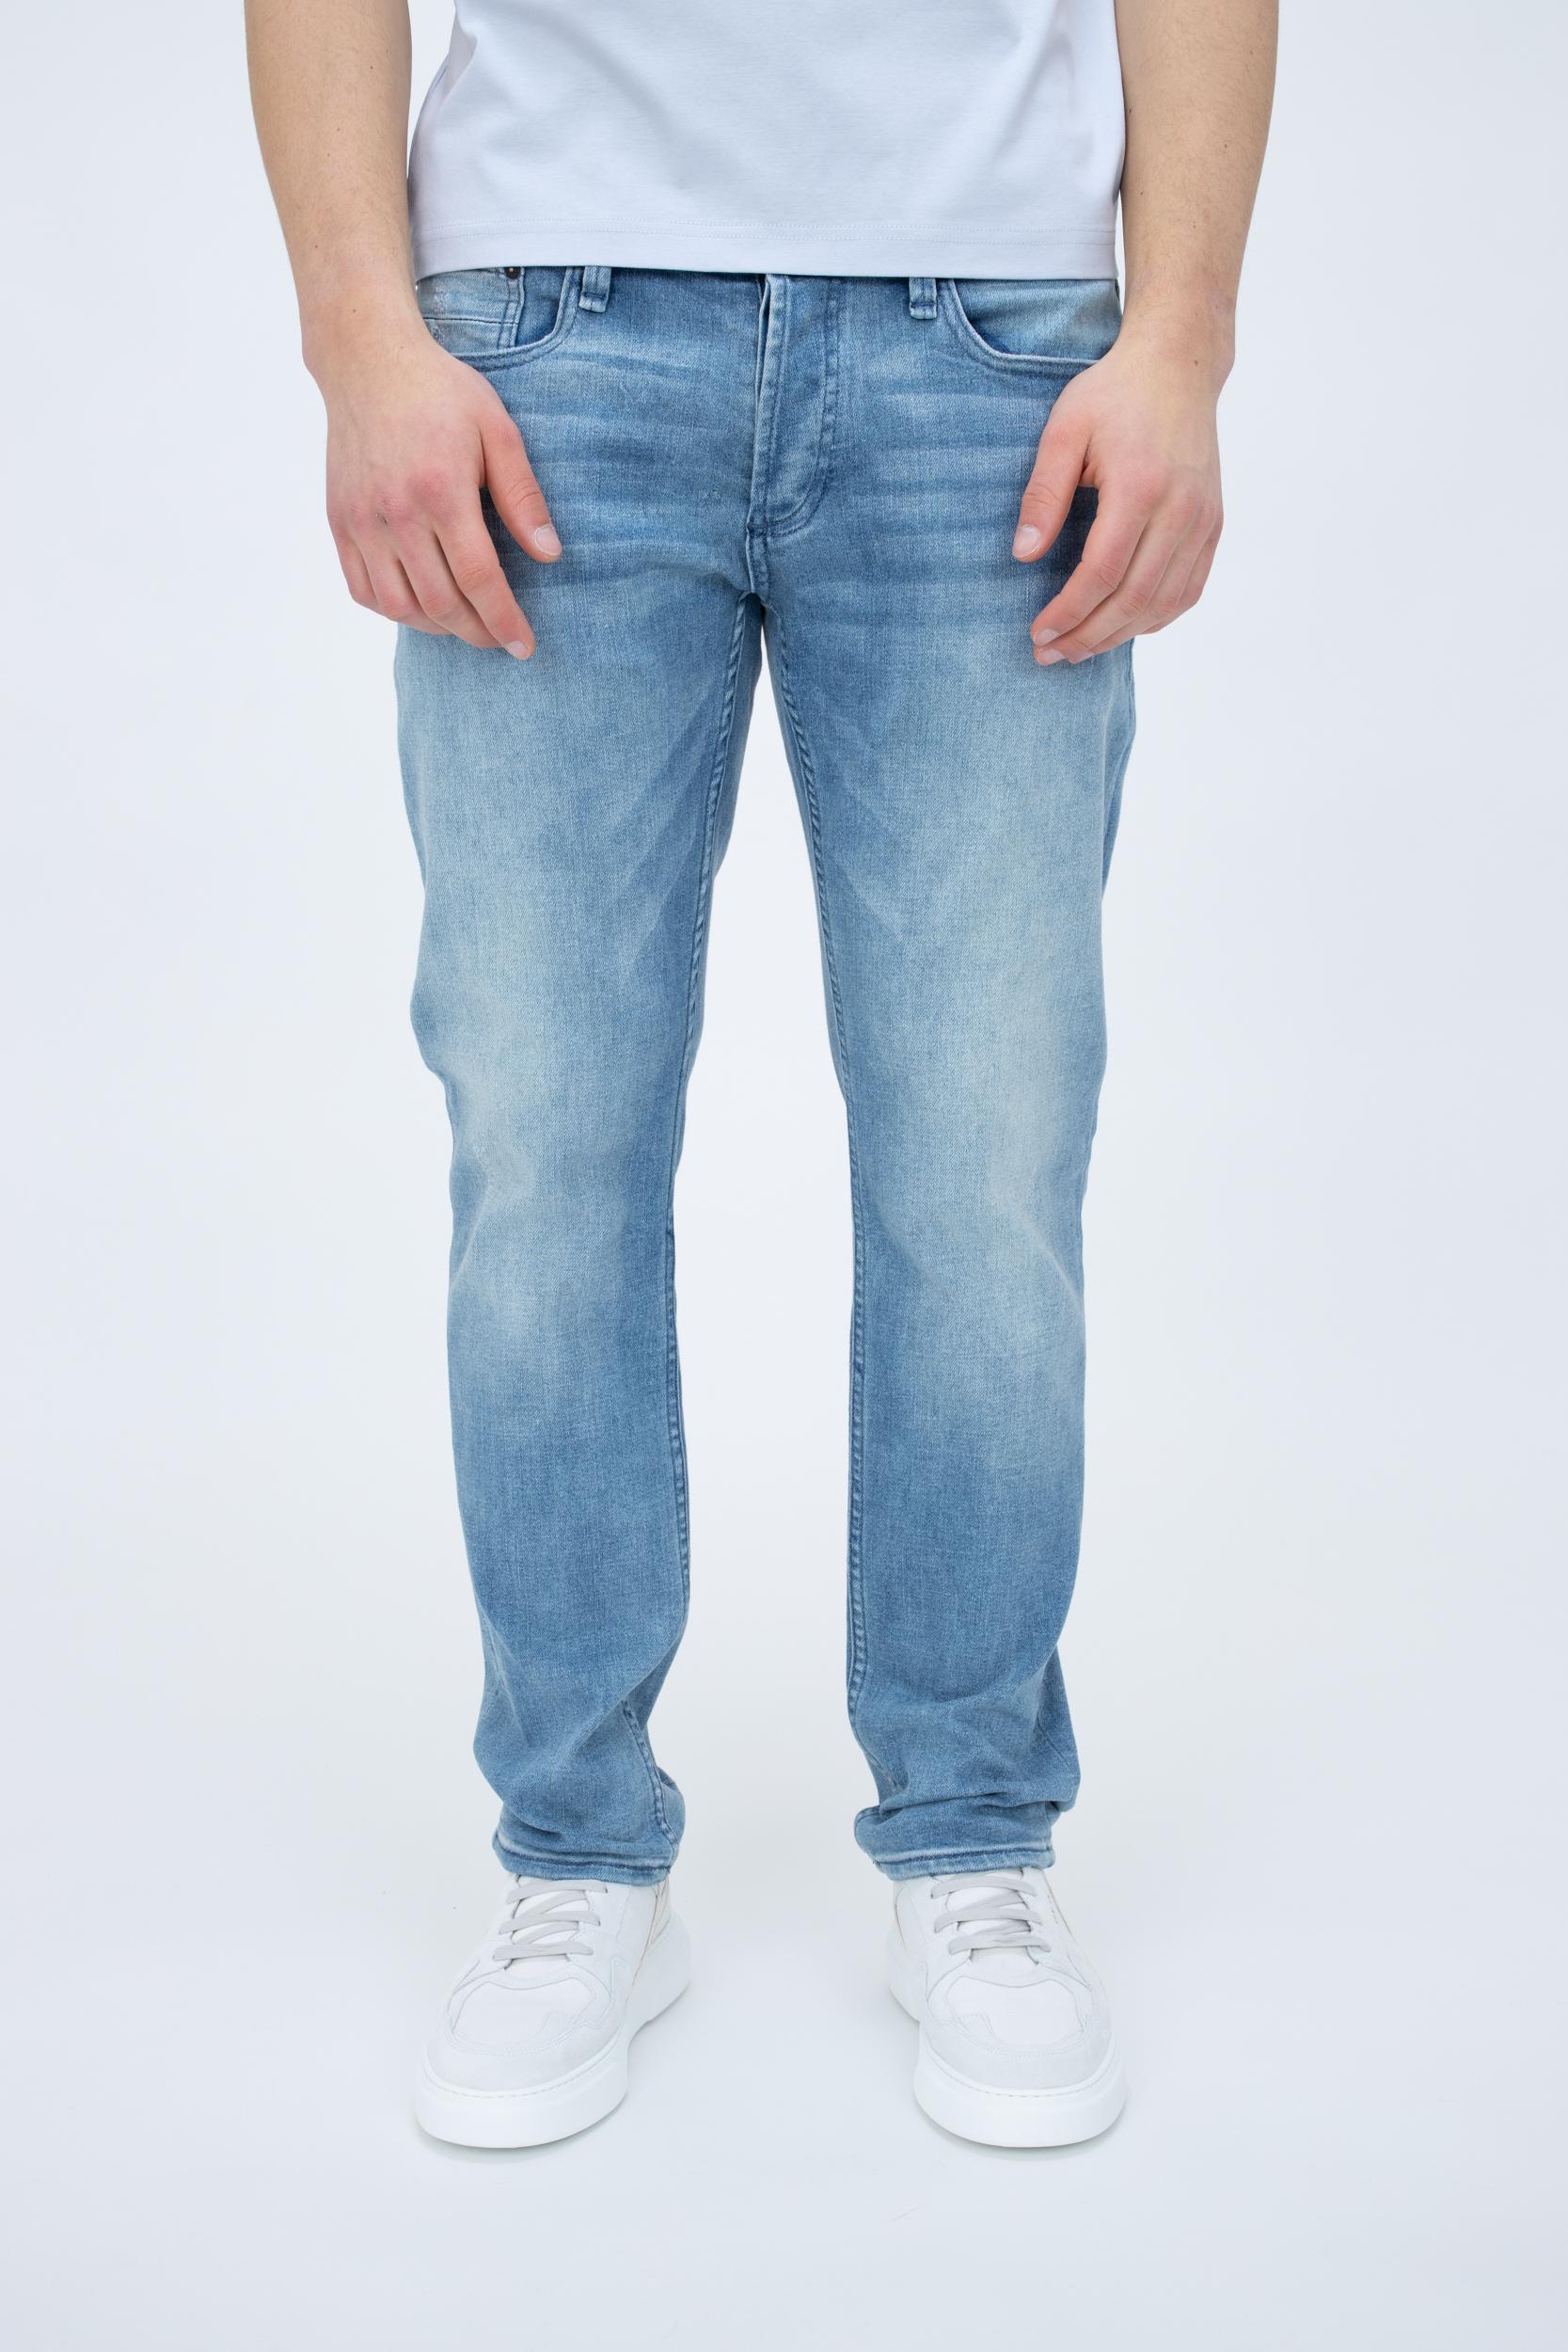 Jeans Razor BLCLB